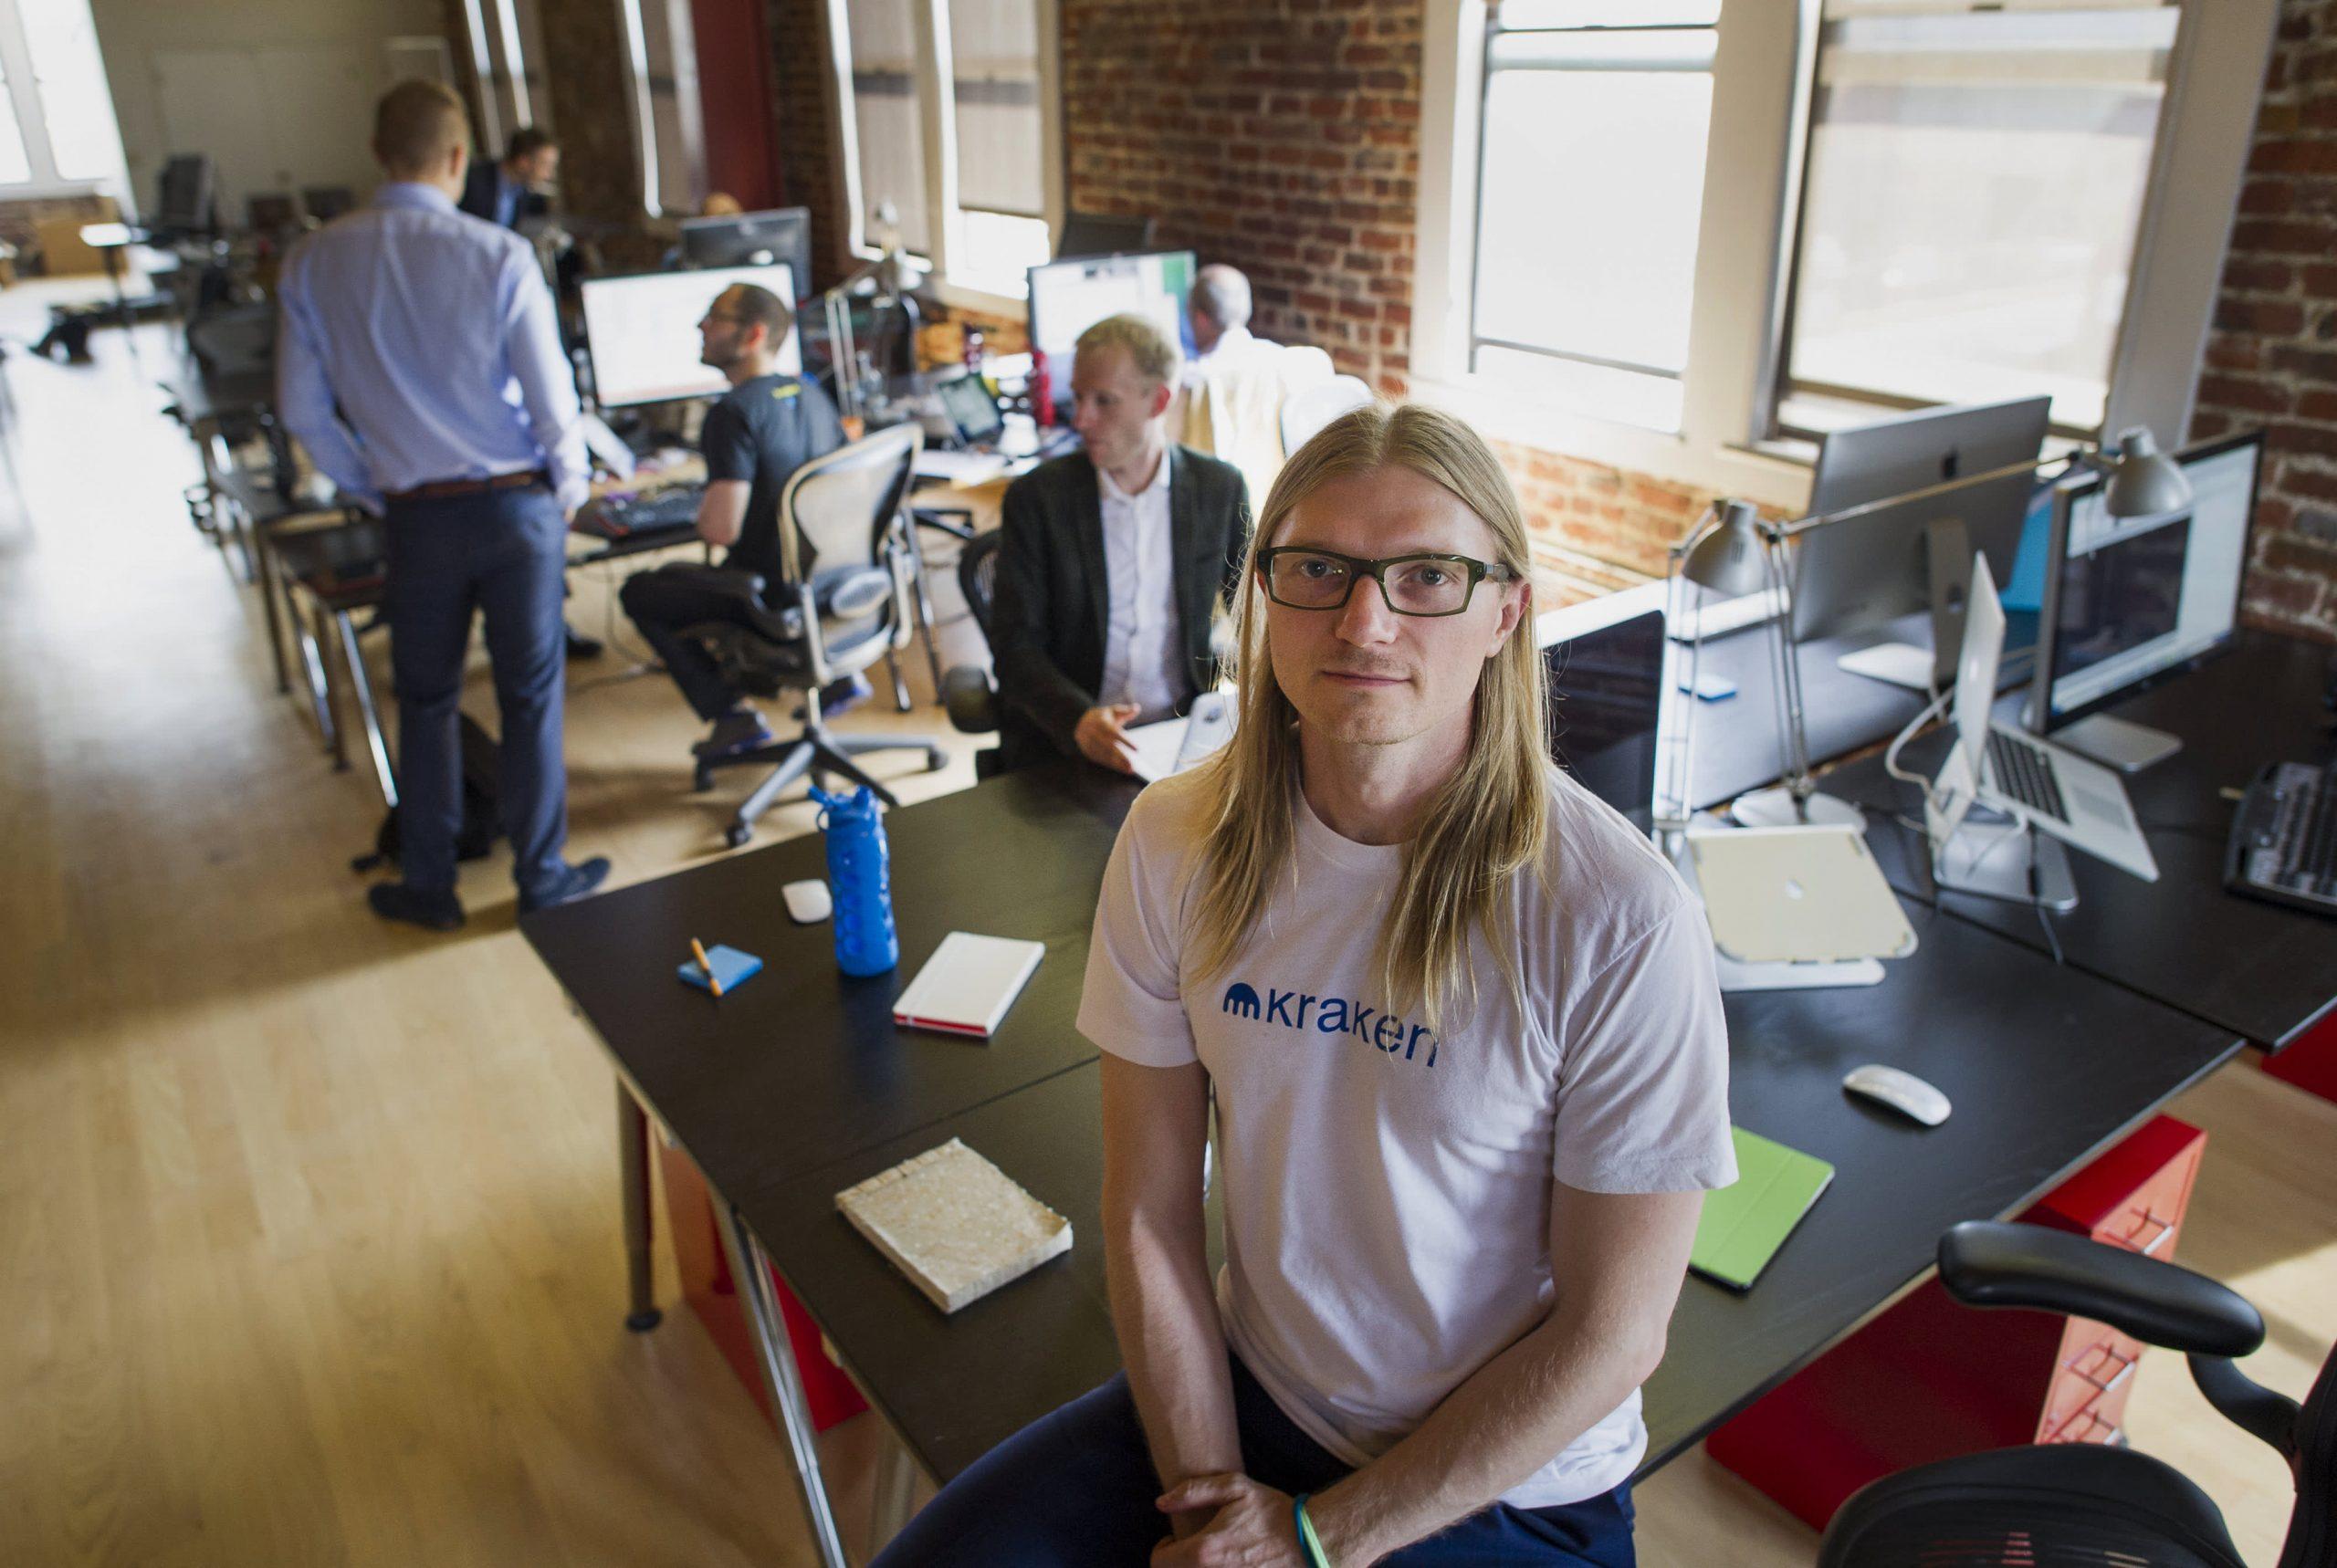 Coinbase rival Kraken may go public via direct listing